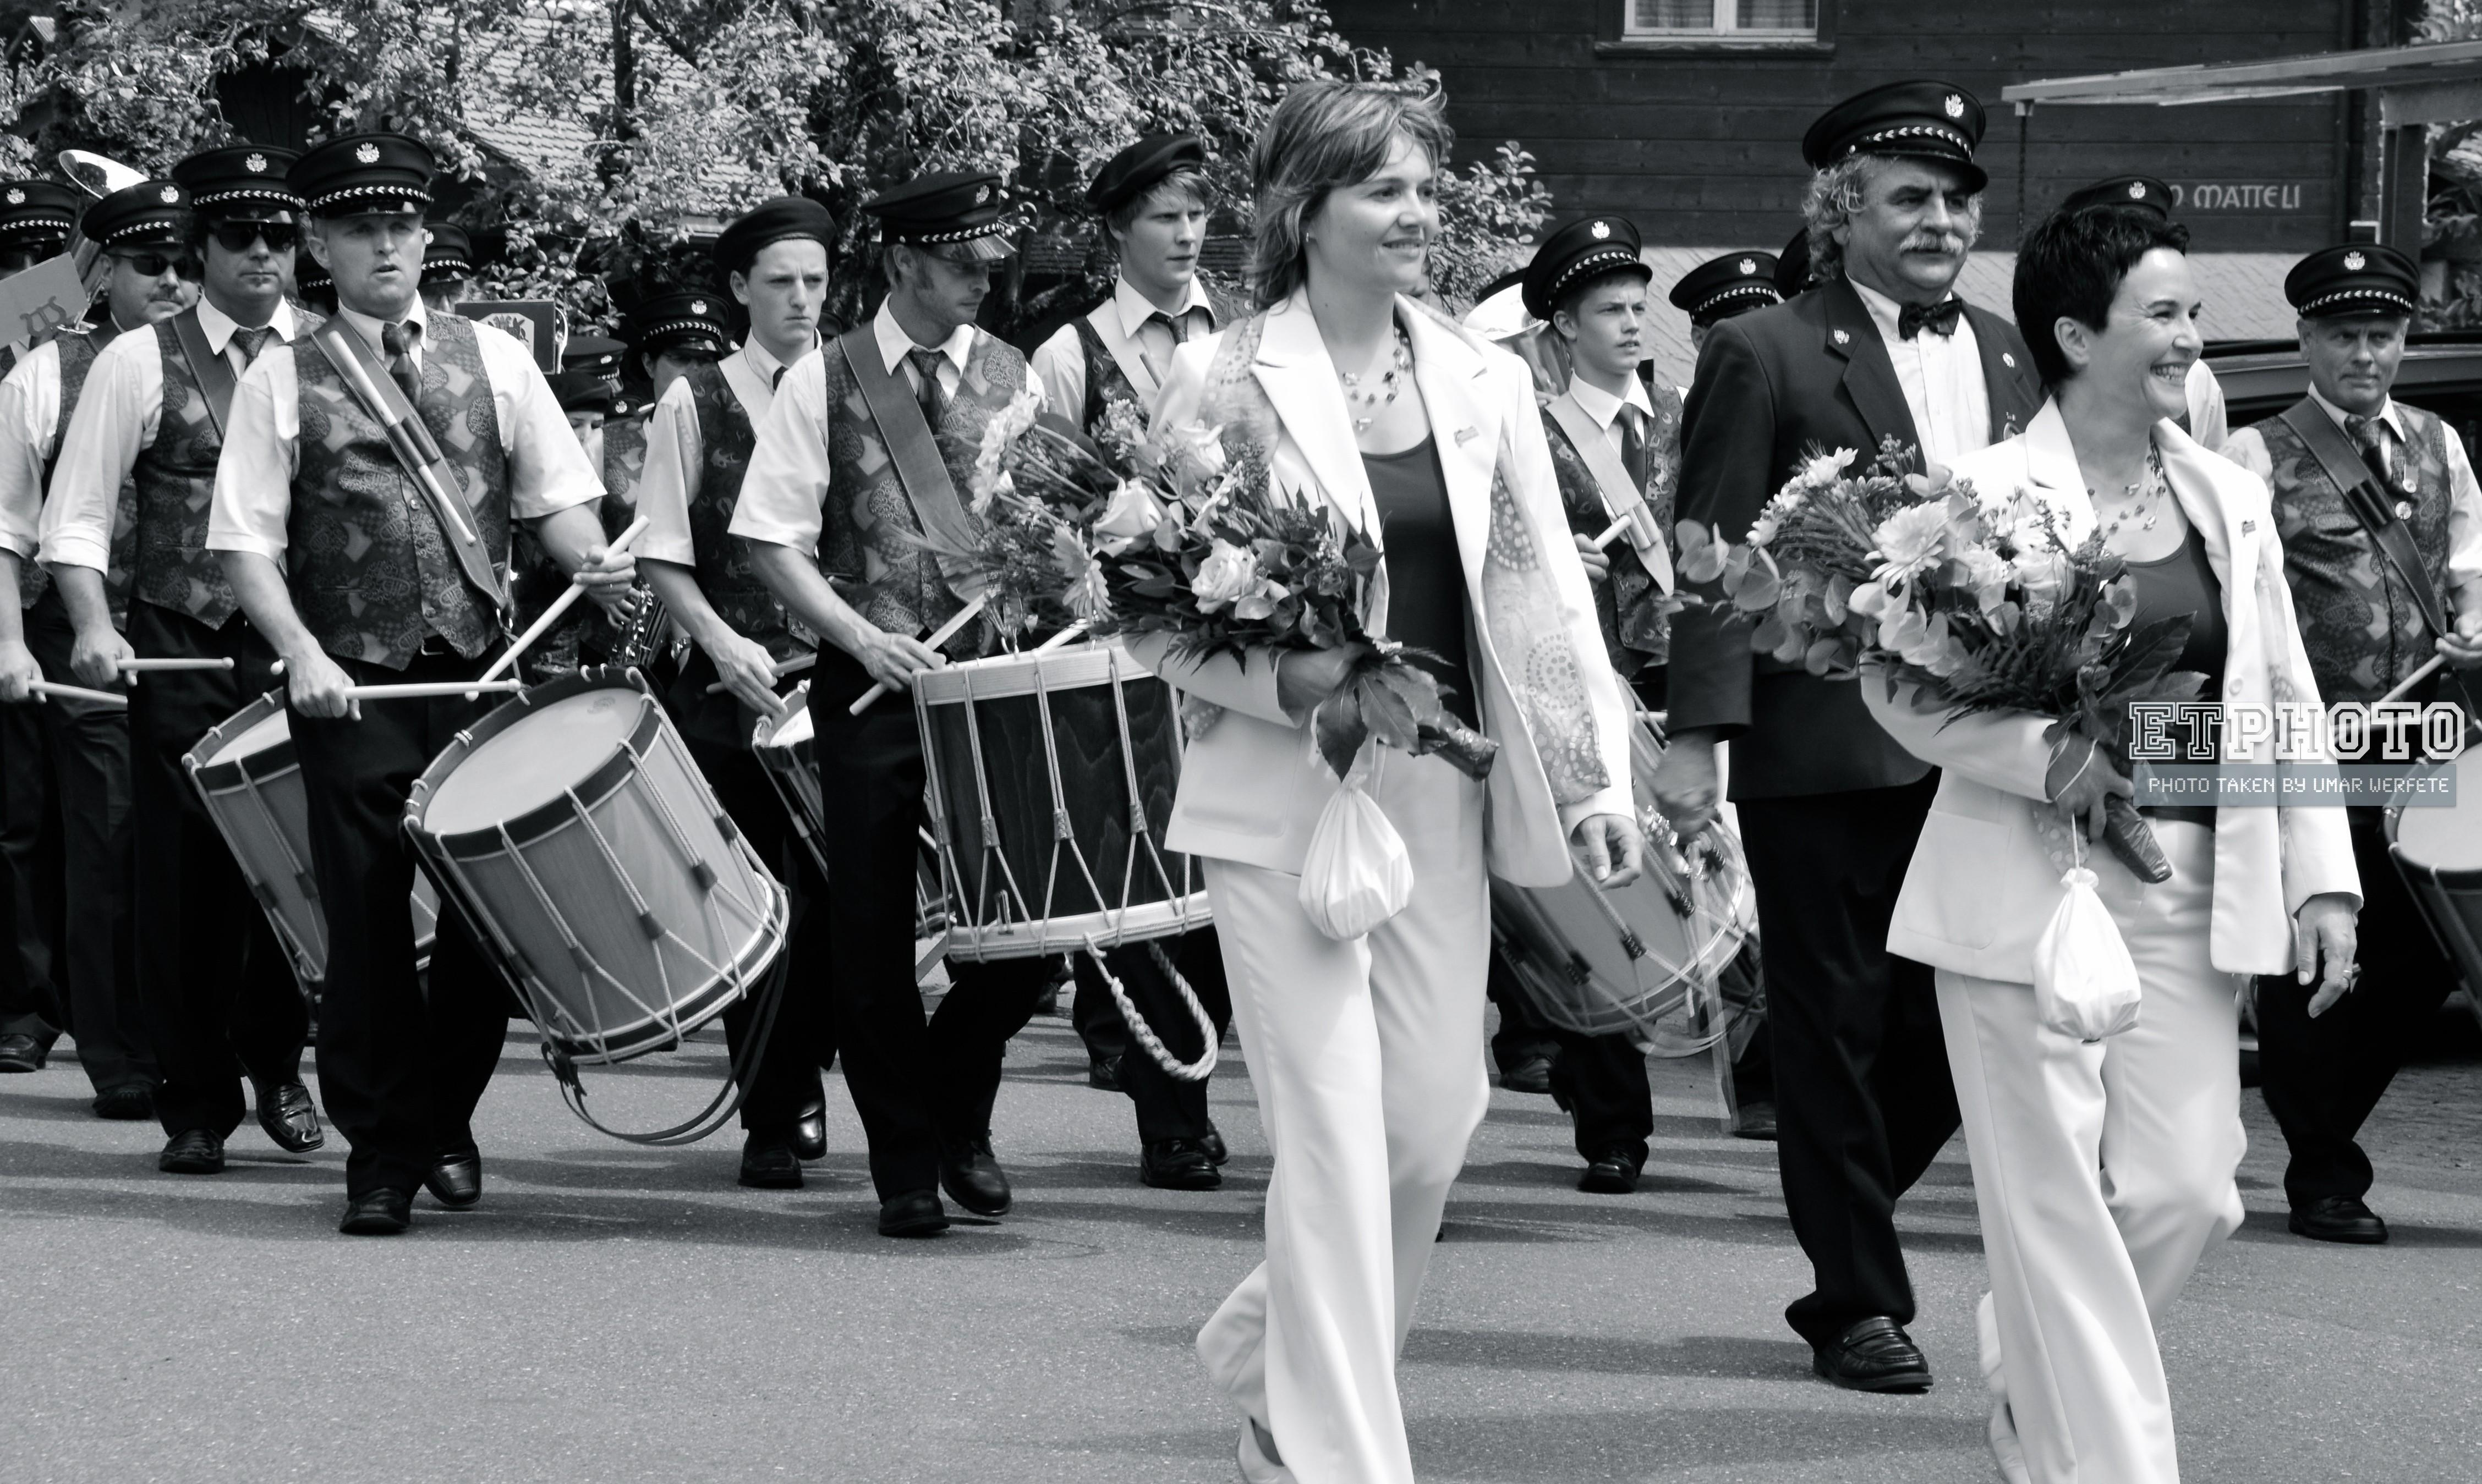 Marching Band Parade Interlaken, Switzerland